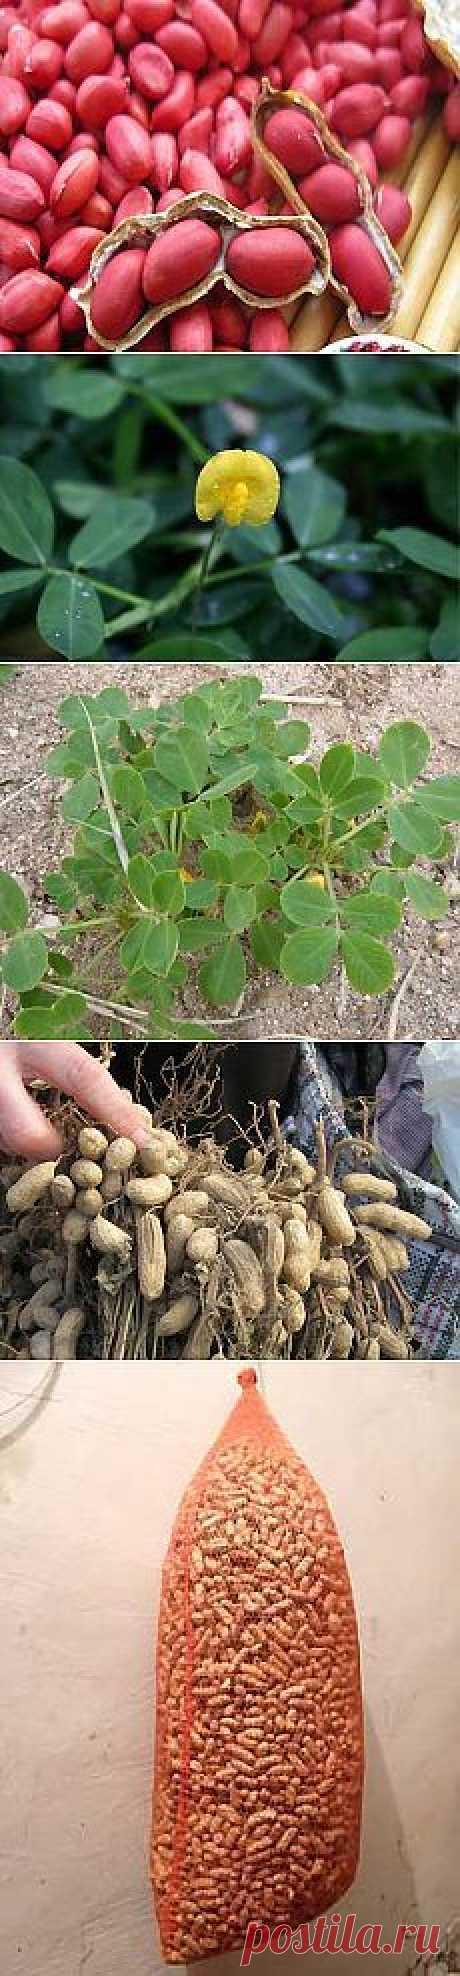 Выращивание арахиса на огороде - посадка, уход, уборка